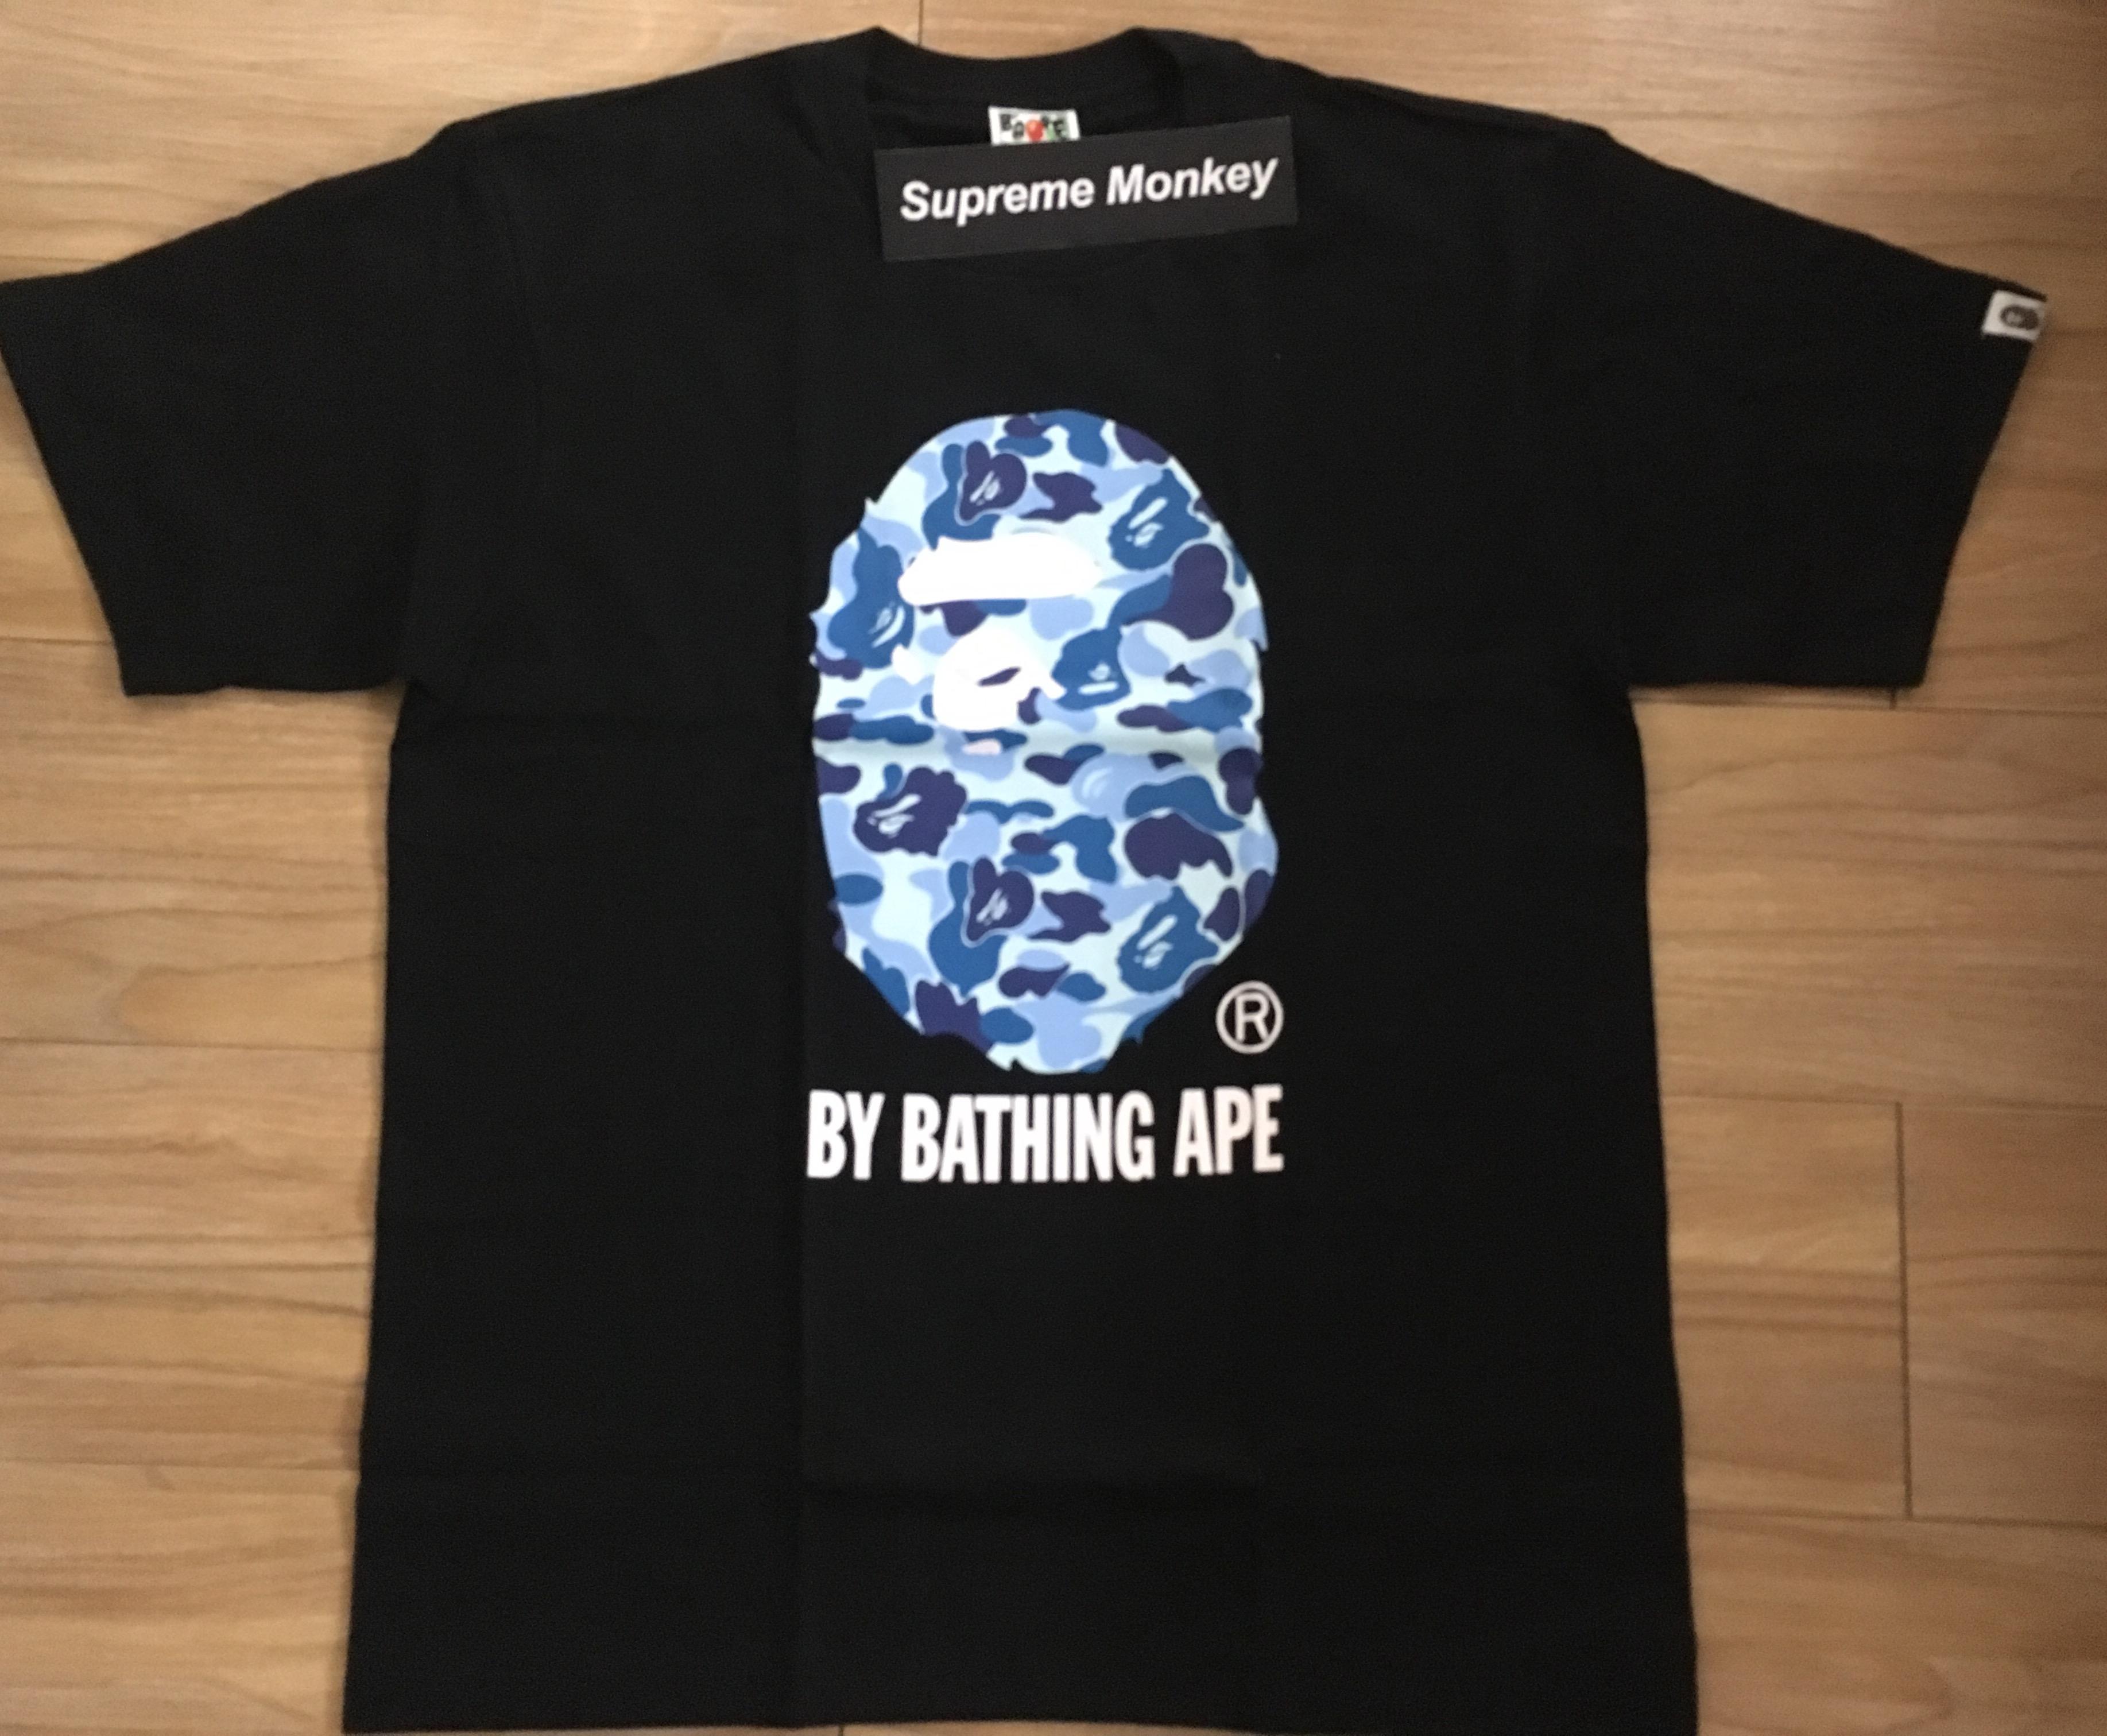 b3e54c37 Bape Abc Camo By Bathing Ape Tee   Grailed